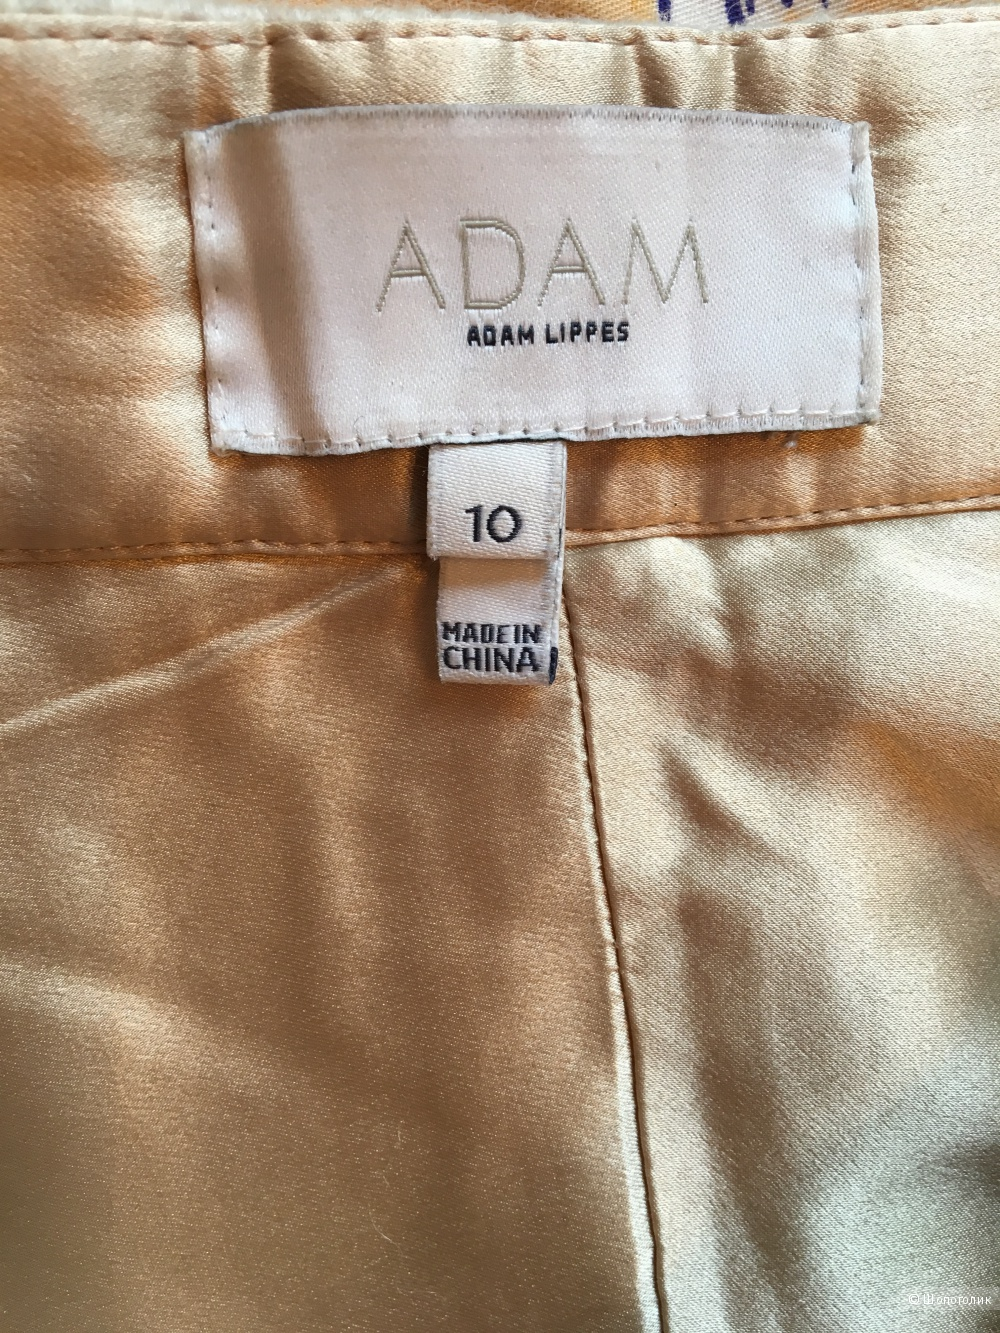 Теплая юбка А-силуэта бренда Adam размер US 10